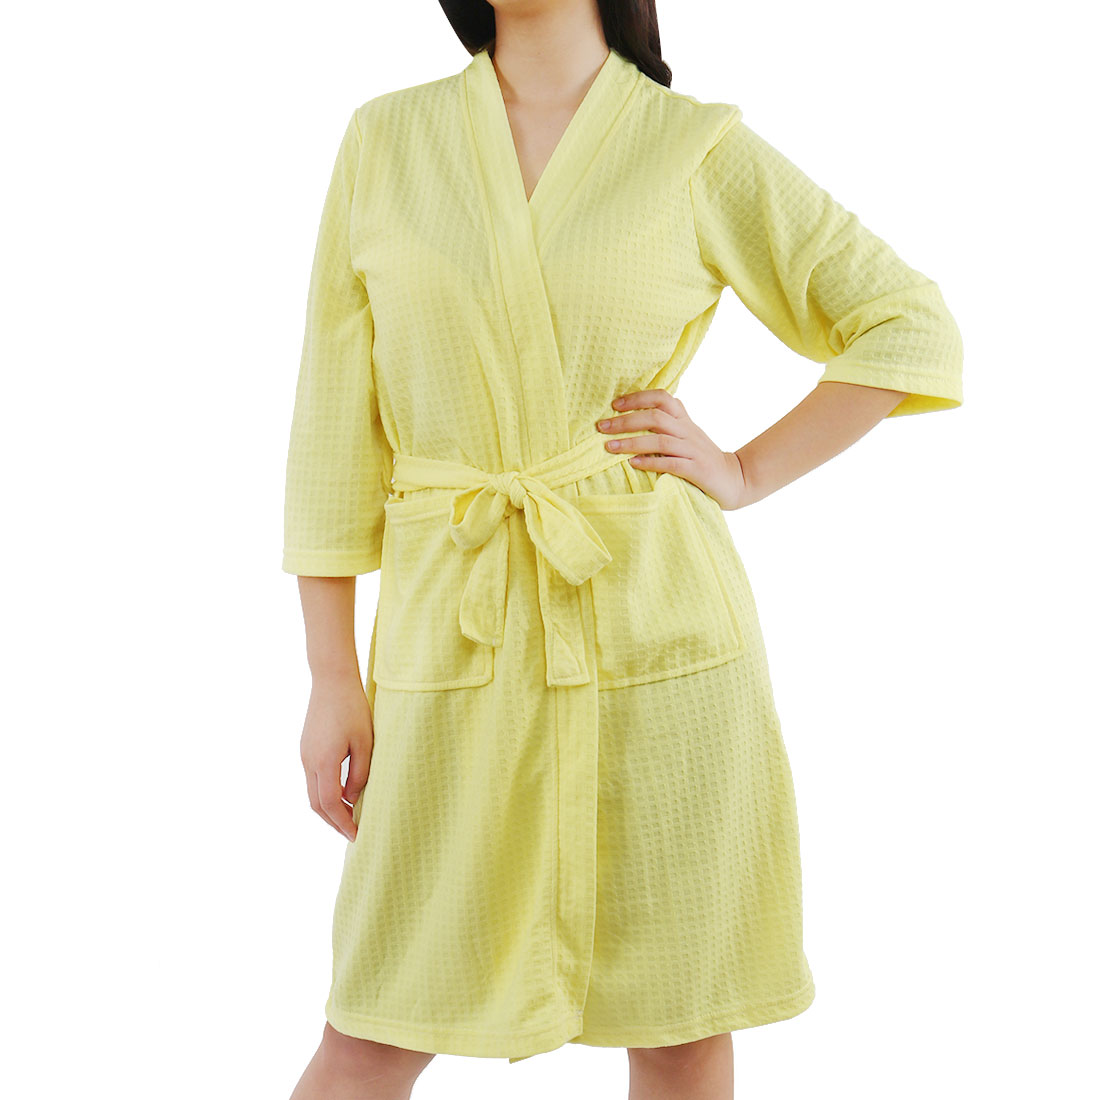 Women's Turkish Cotton Lightweight Soft Warm Kimono Short Robe XL Yellow